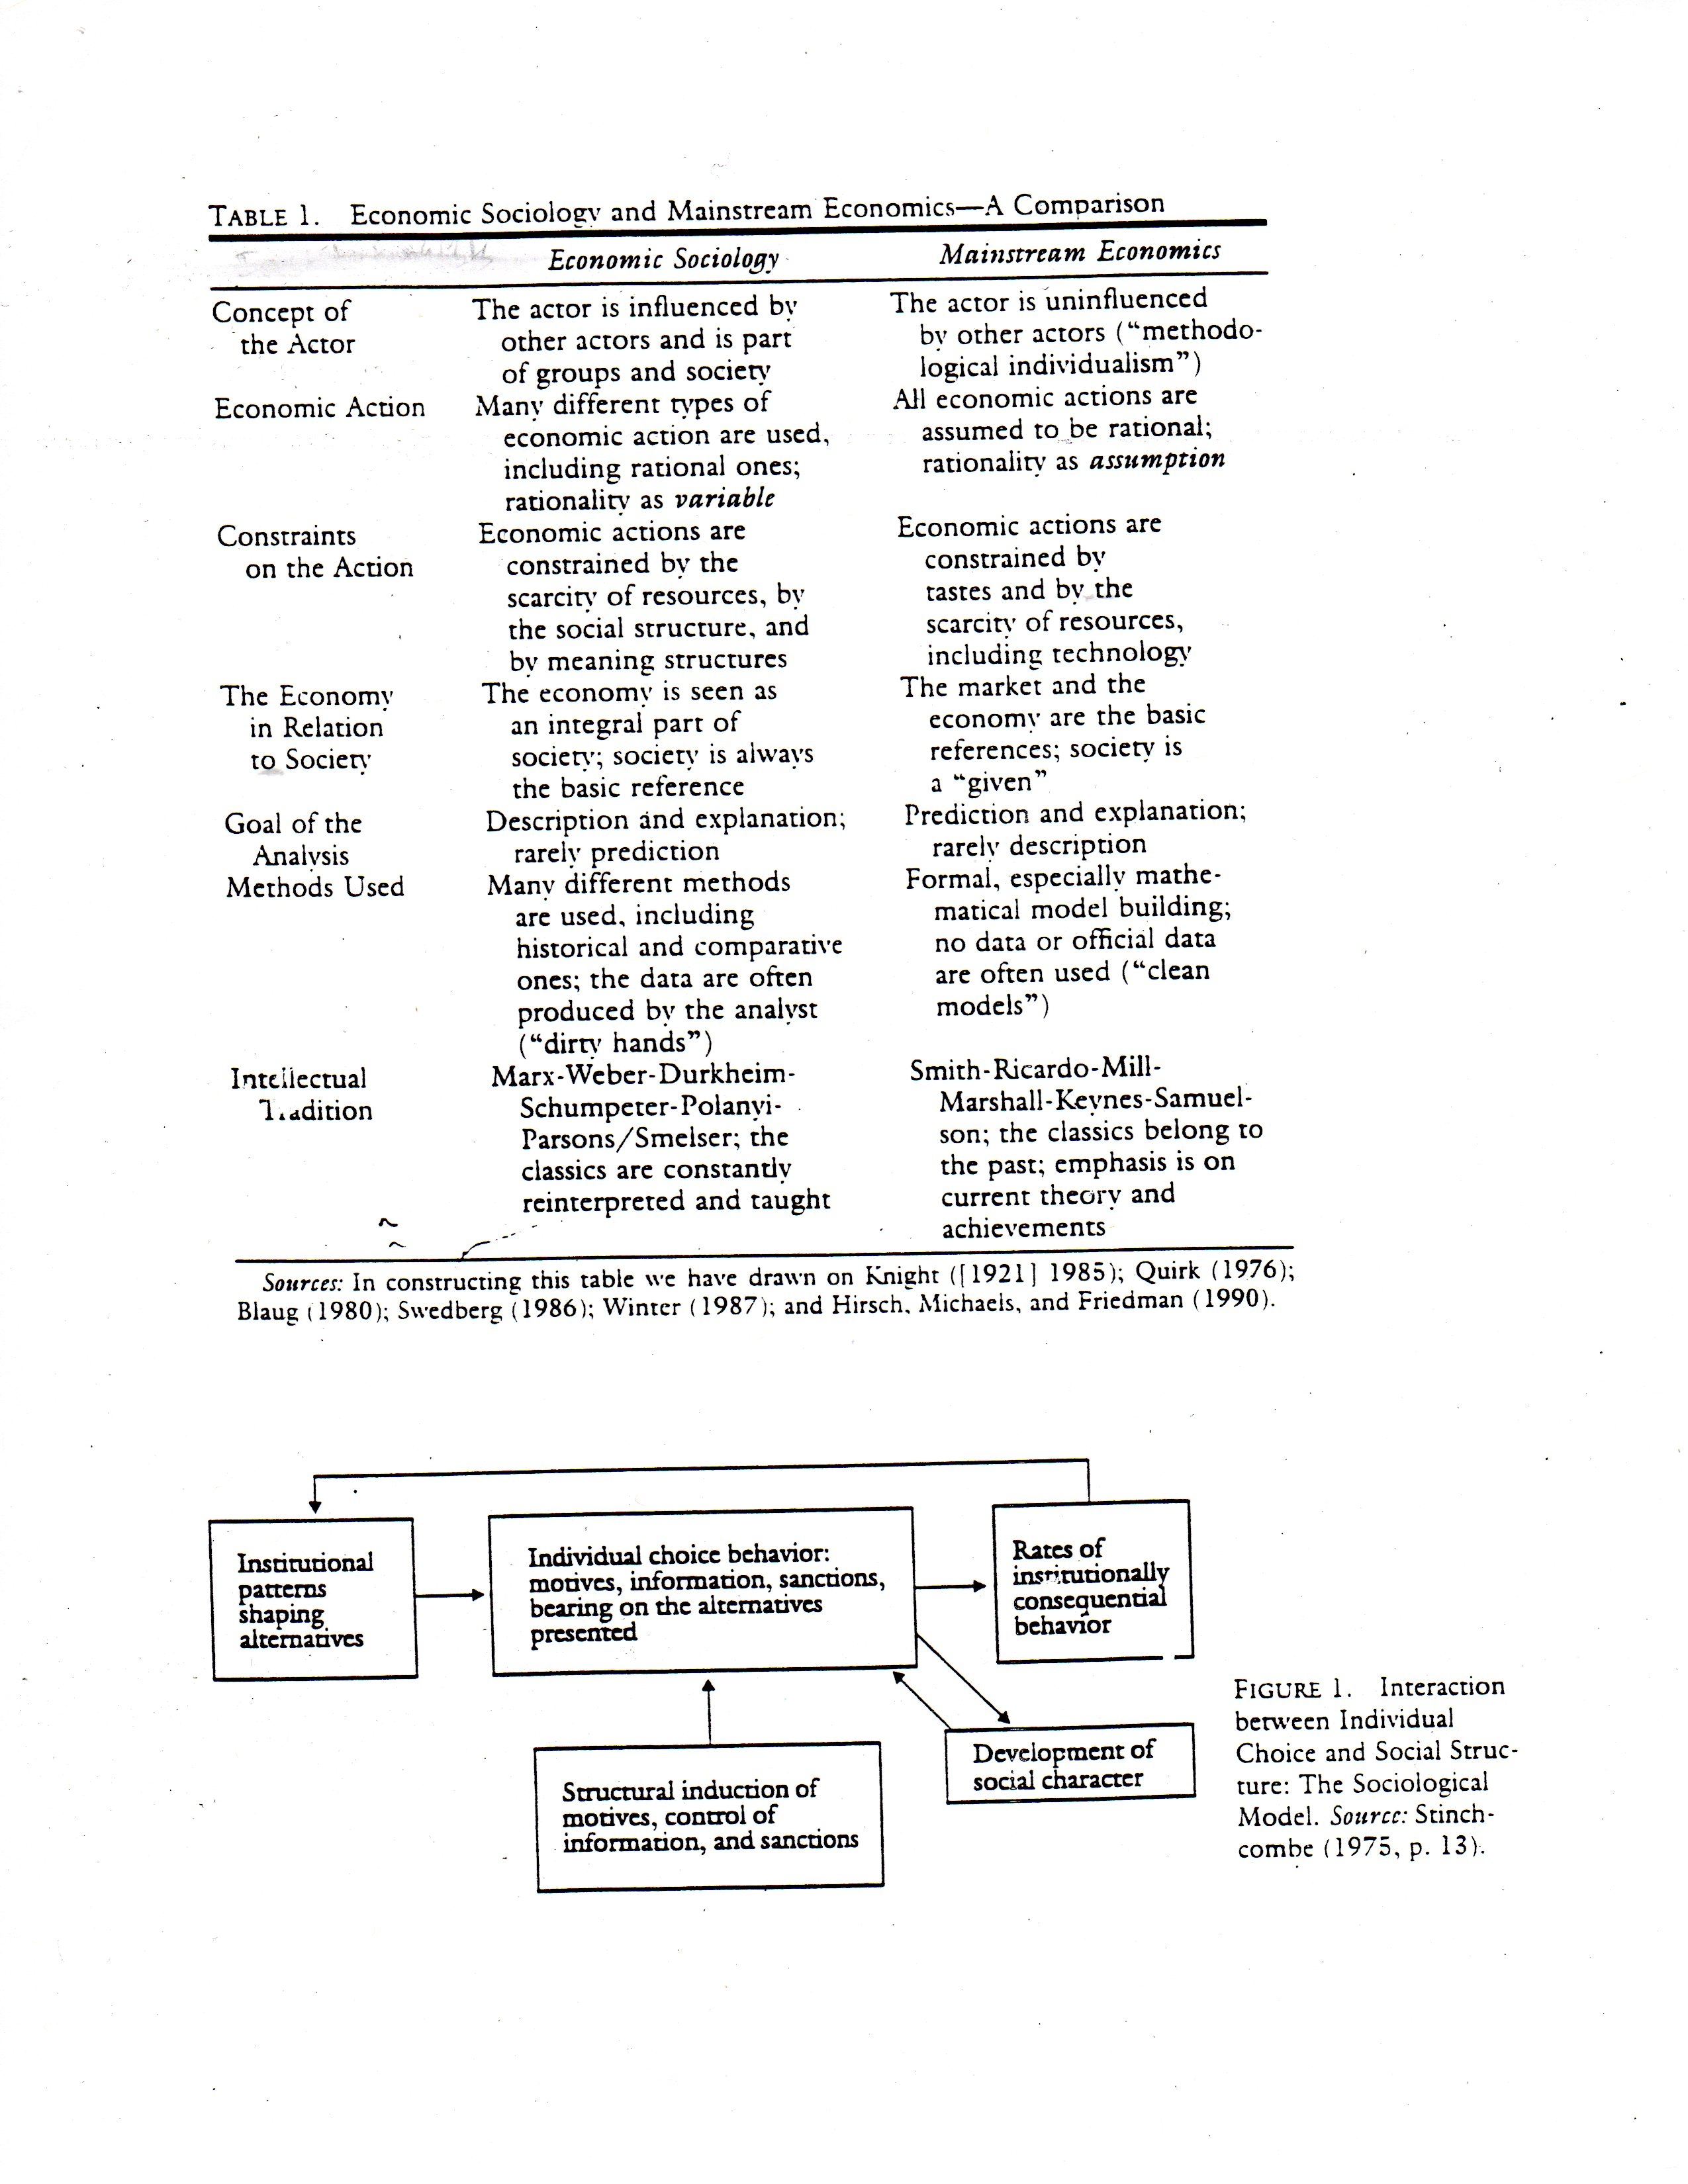 Unpublished dissertation on Media's misrepresentation in Iran between 1982-84?